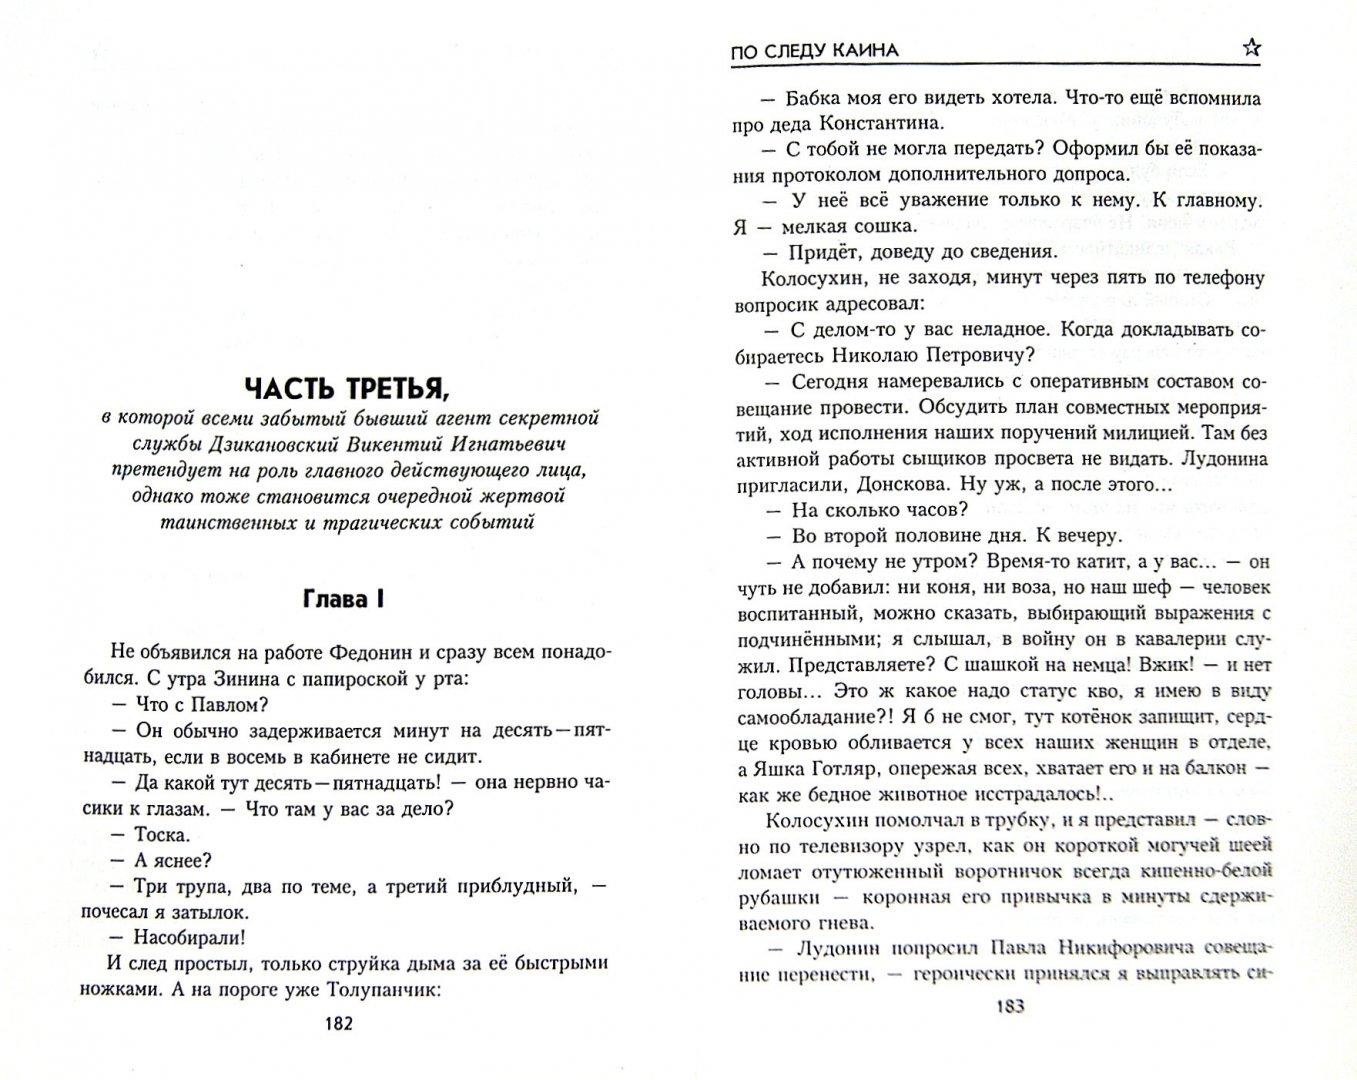 Иллюстрация 1 из 29 для По следу Каина - Вячеслав Белоусов | Лабиринт - книги. Источник: Лабиринт